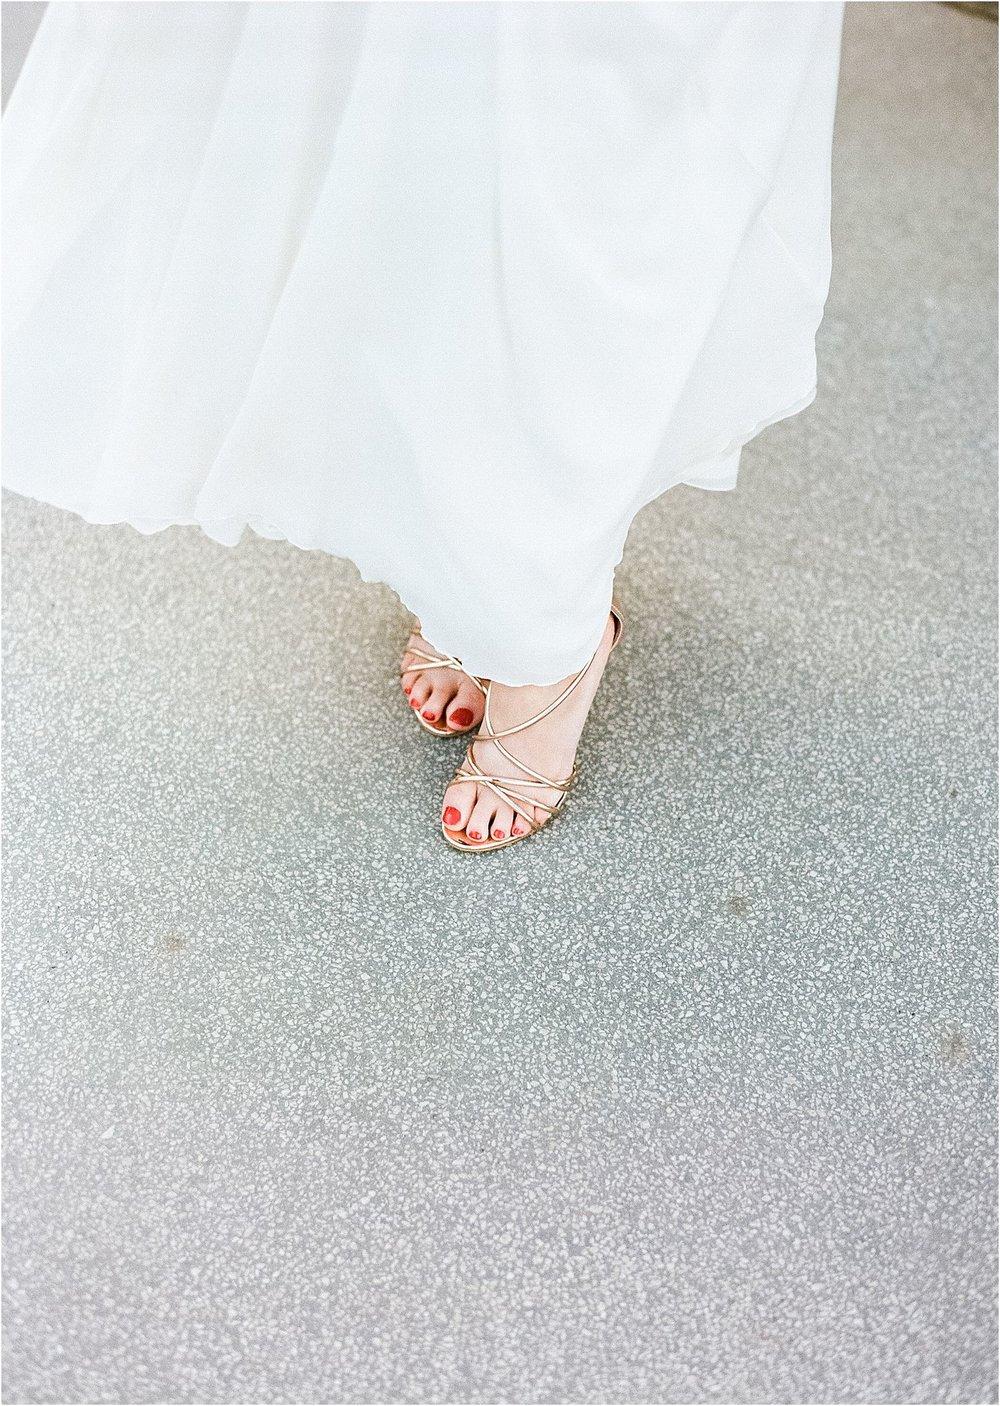 styleshooting-braut2019-neuer-trend-karoline-kirchhof-fotografie (10).jpg